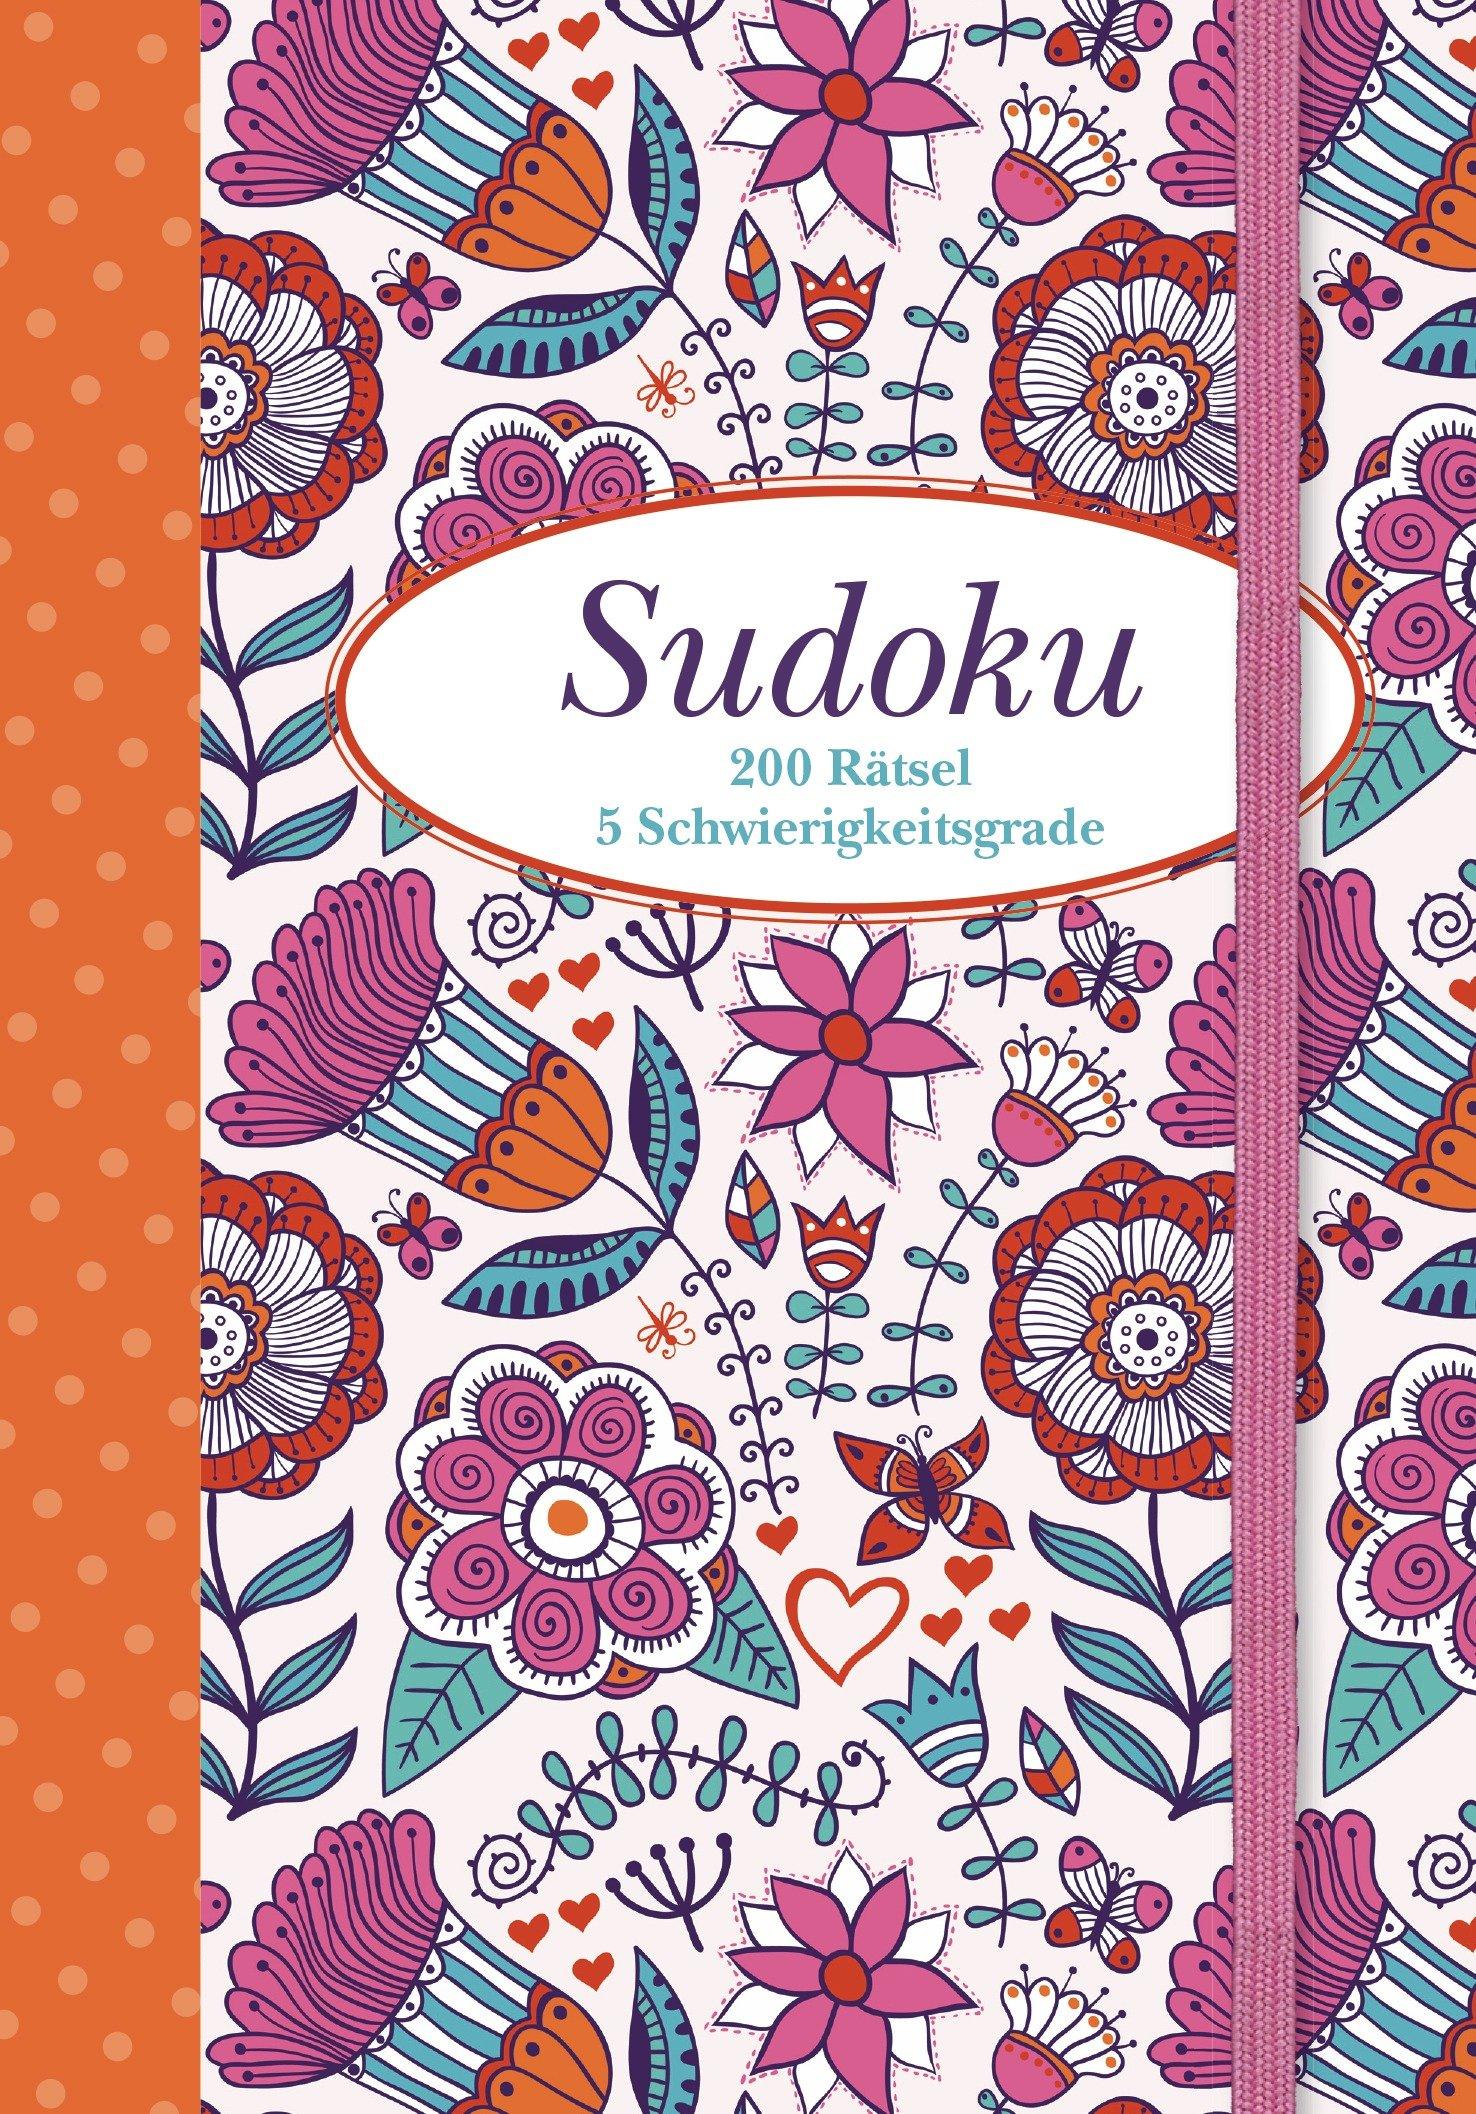 Sudoku (1): 200 Rätsel * 5 Schwierigkeitsgrade